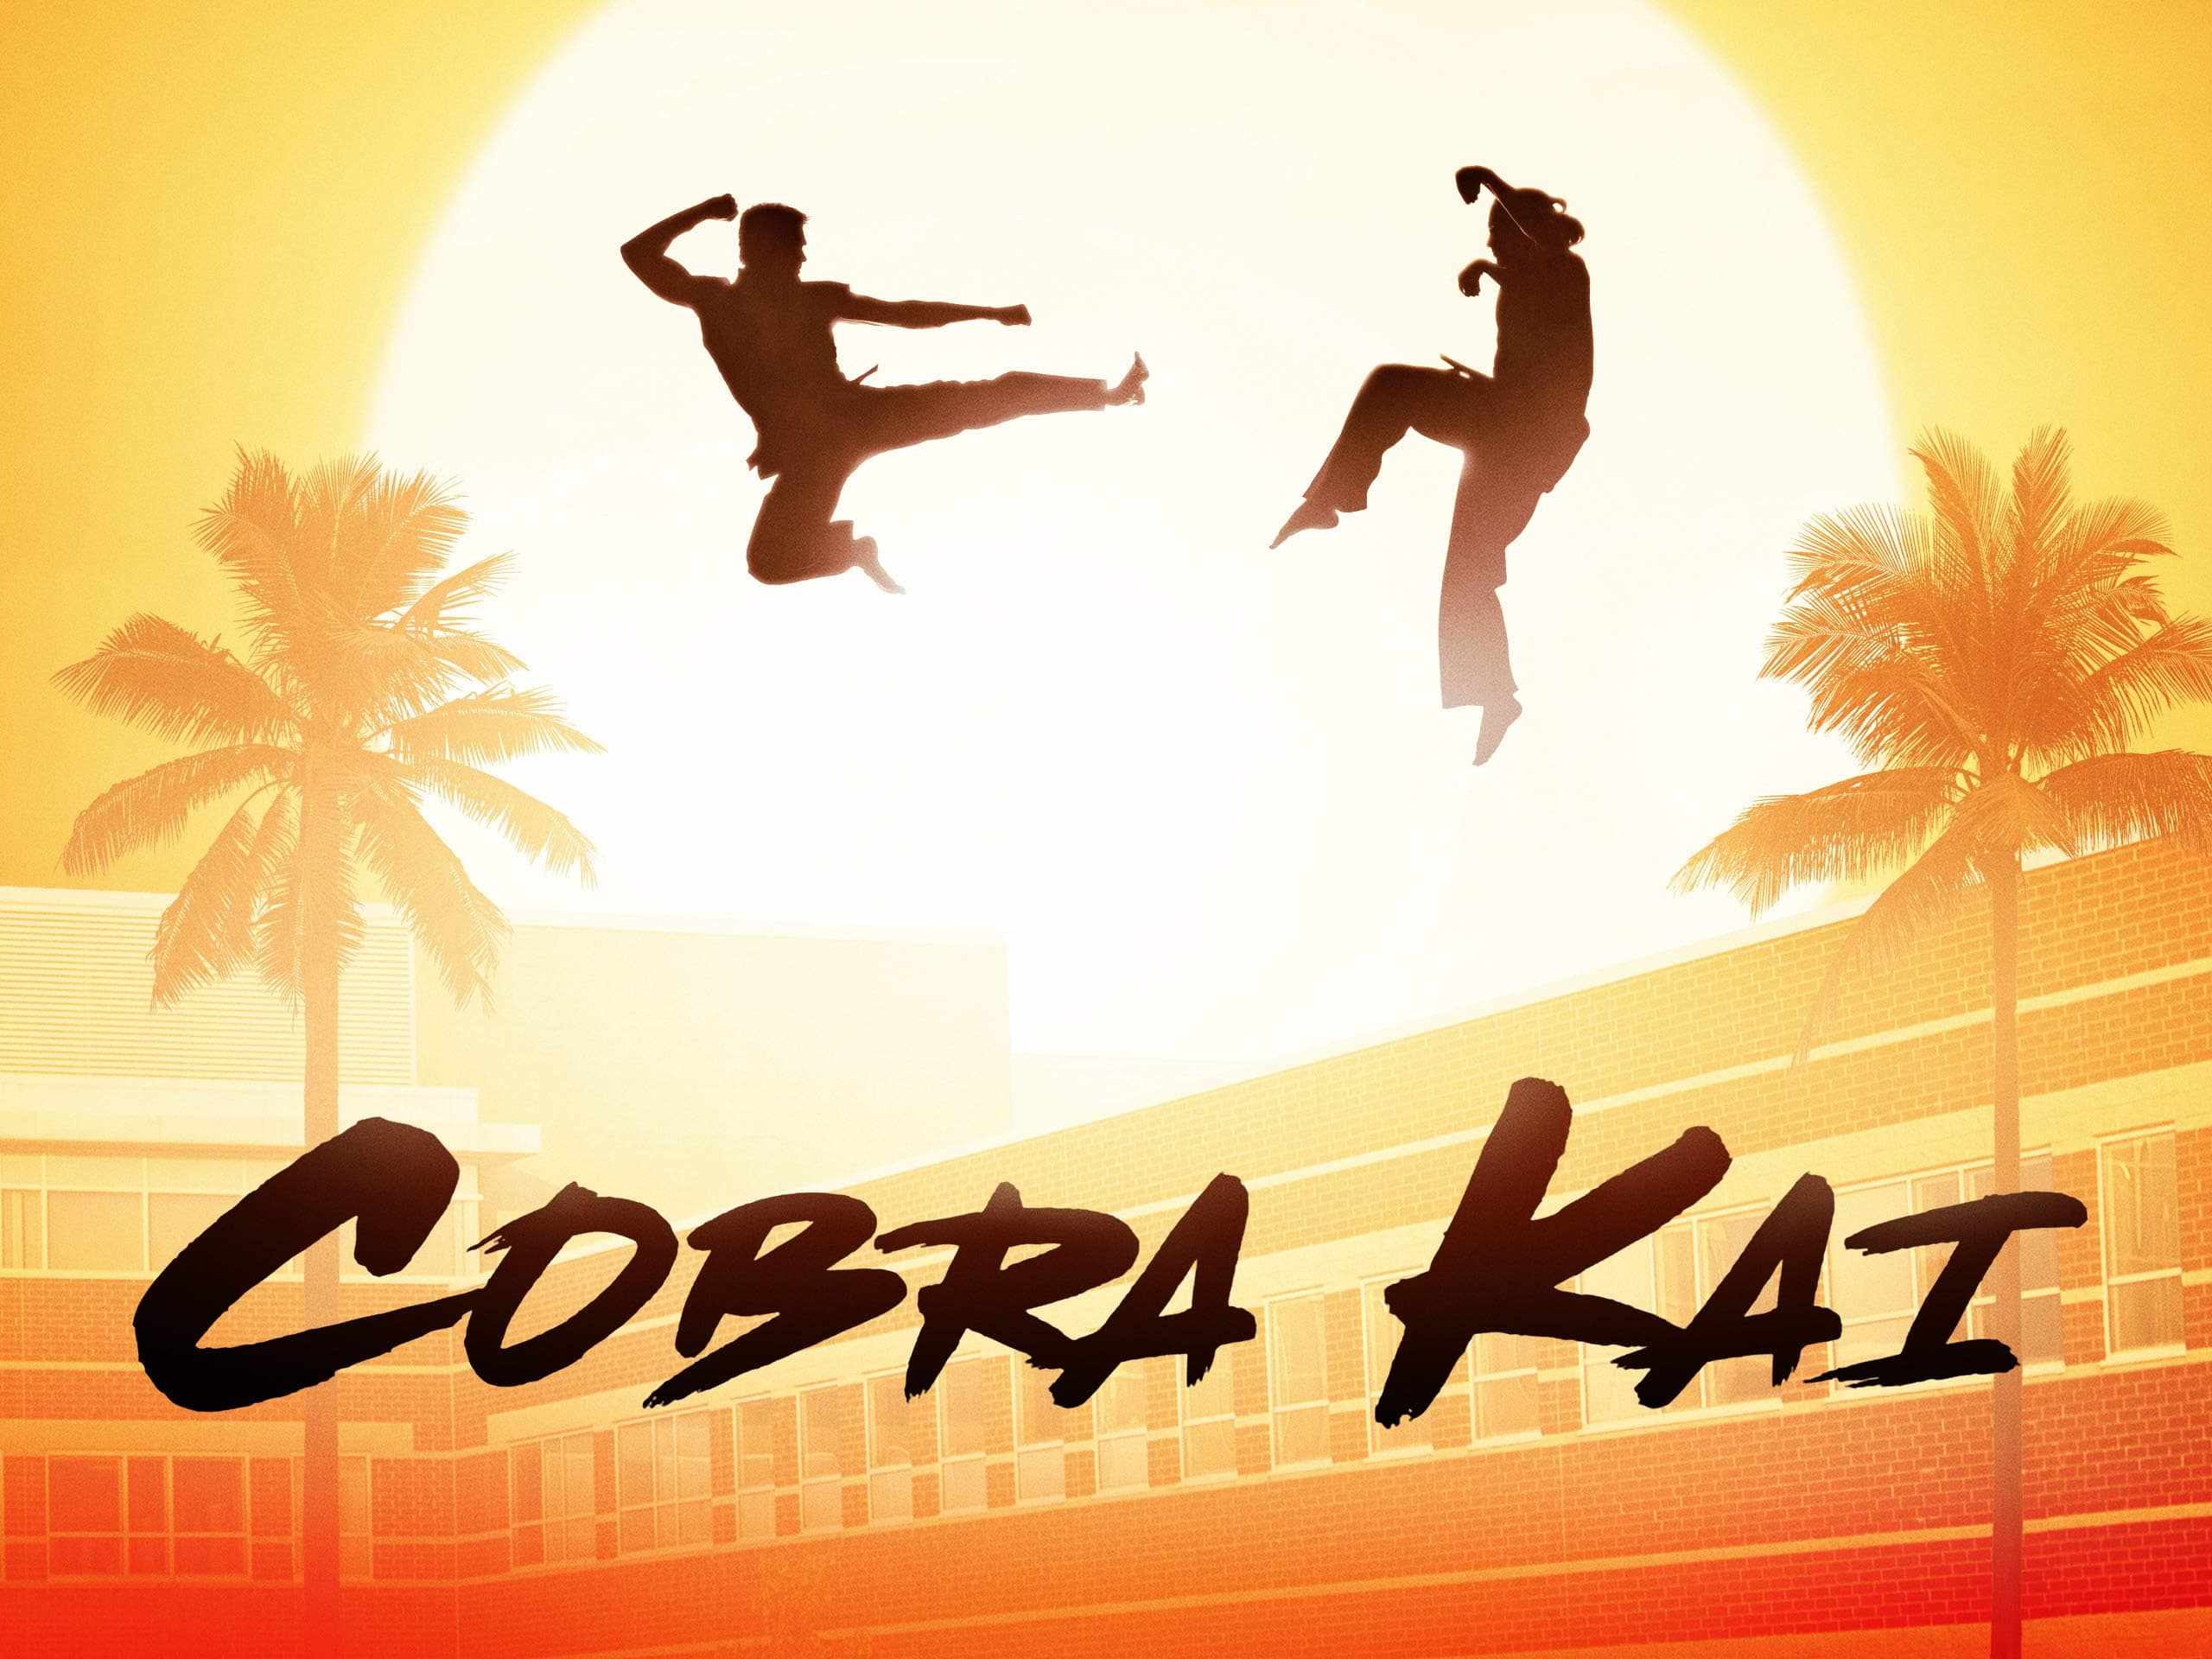 Cobra Kai - Season 1 - Vudu - $10